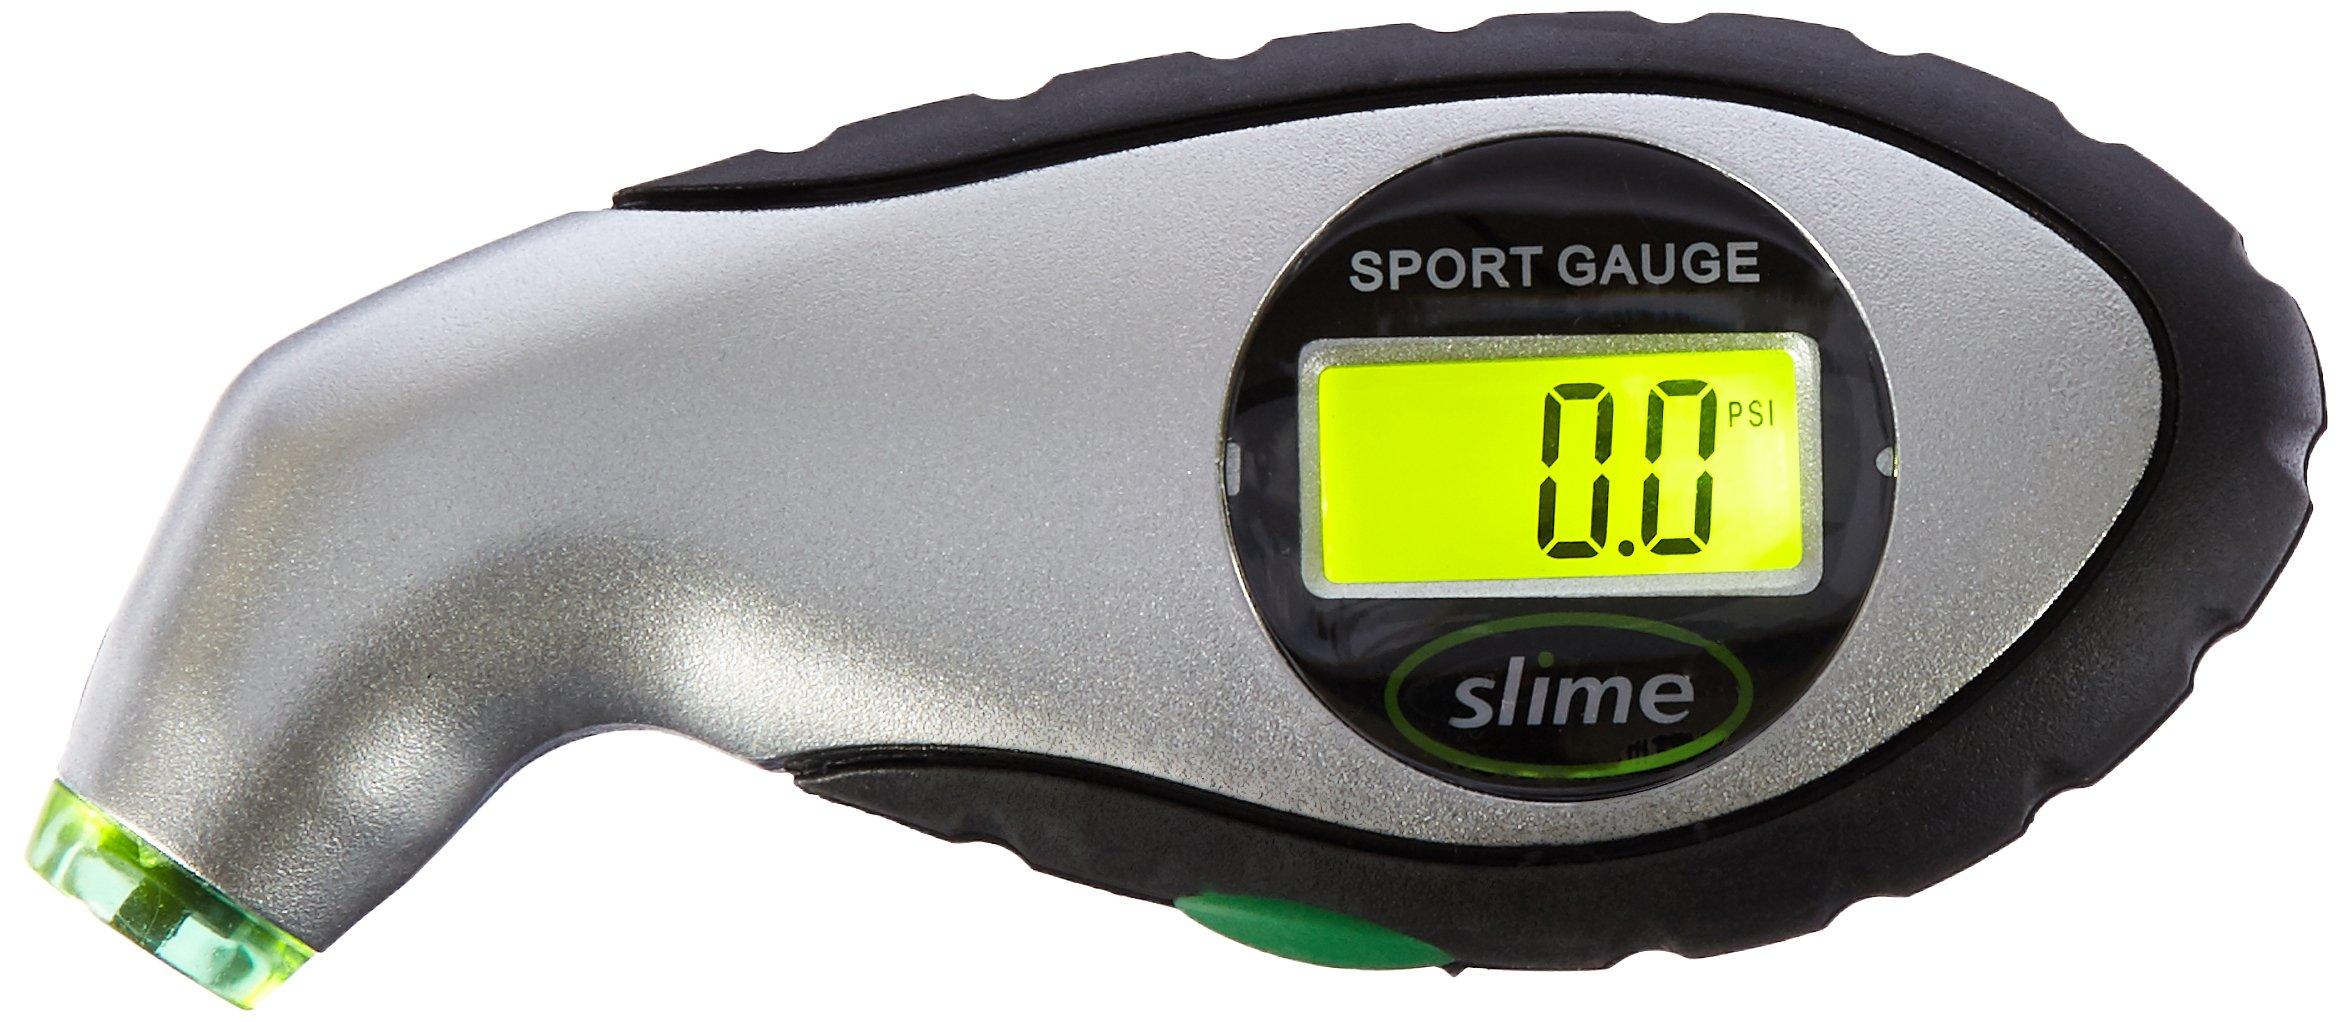 Slime 20017-4PK Digital Tire Gauge (5-150LB) by Slime (Image #1)